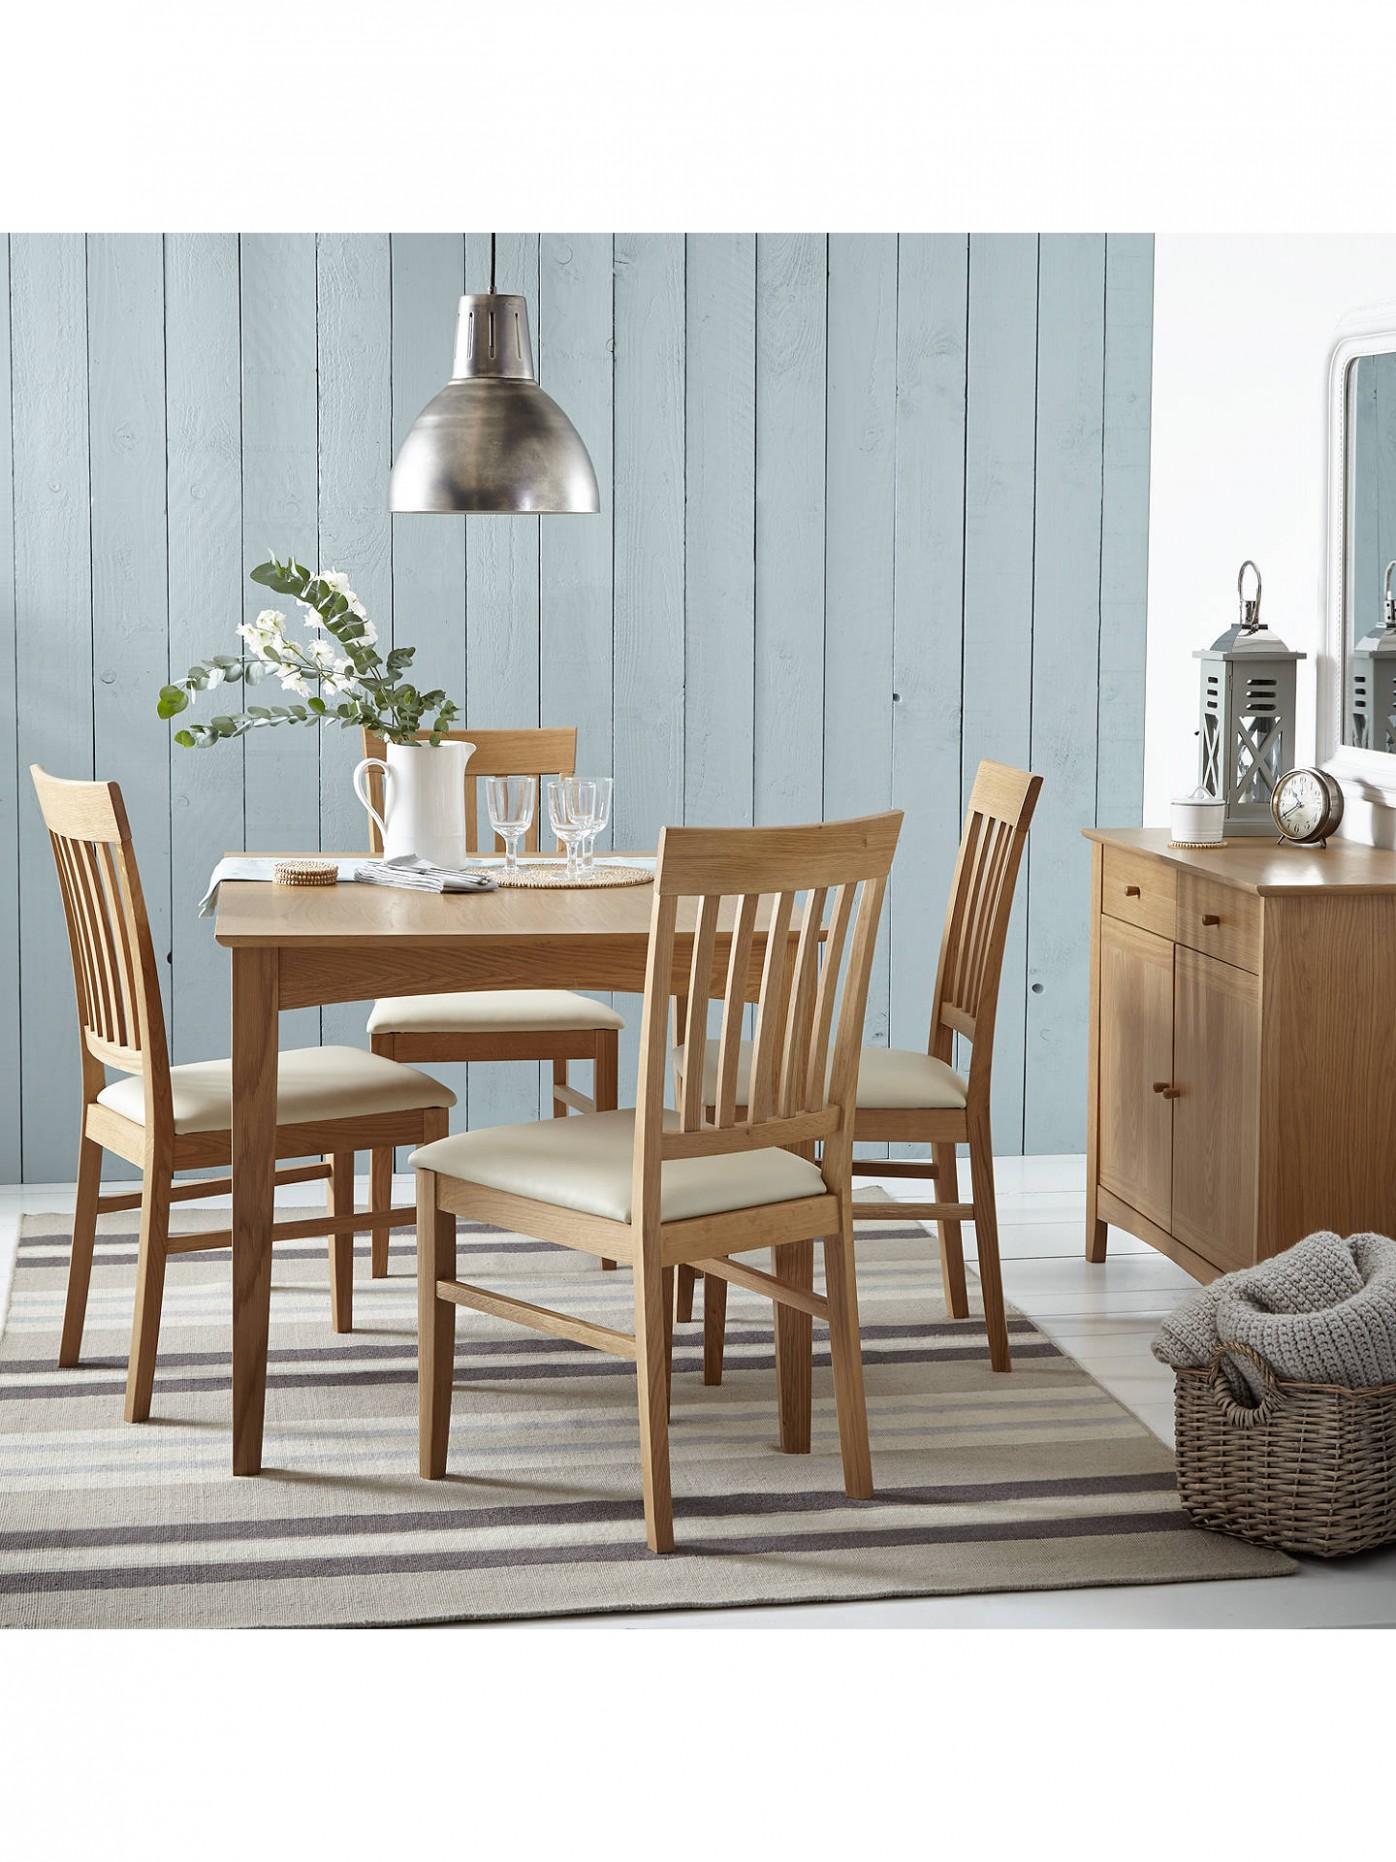 John Lewis & Partners Alba 9-9 Seater Extending Dining Table, Oak - John Lewis Dining Room Ideas